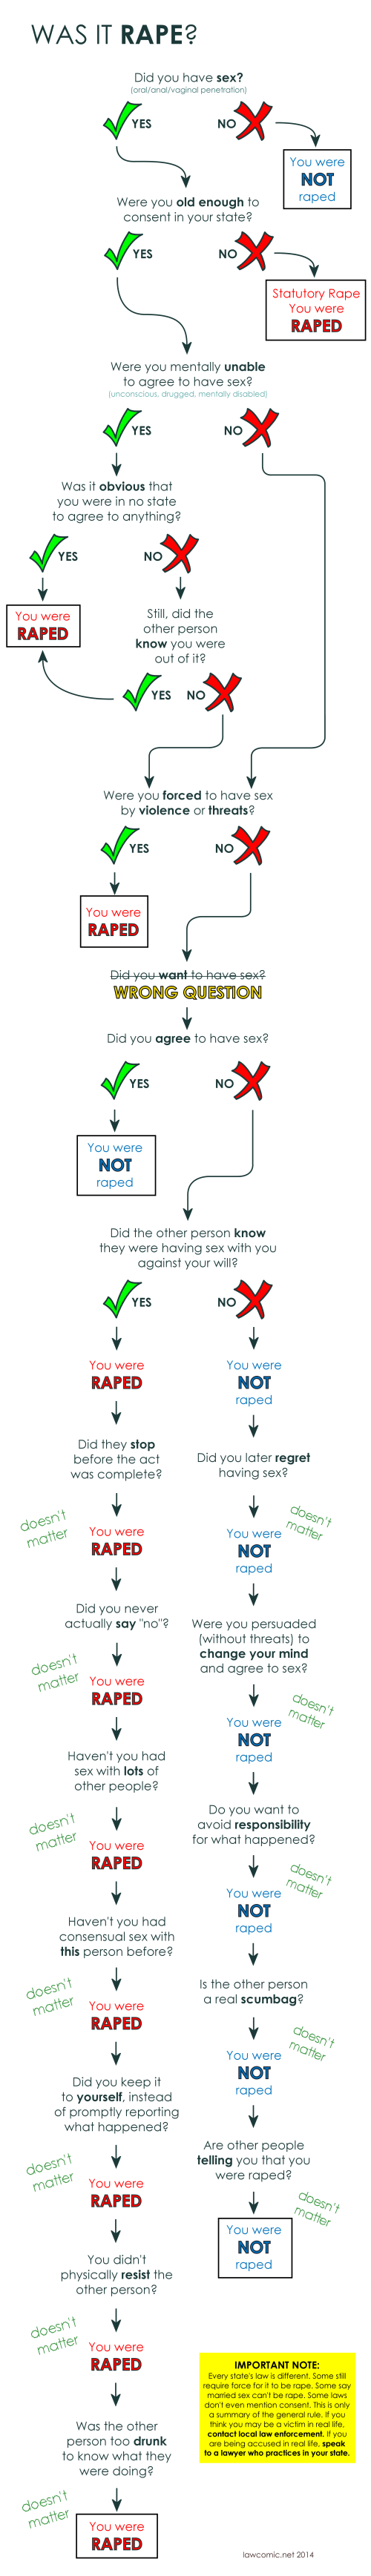 rape_flowchart